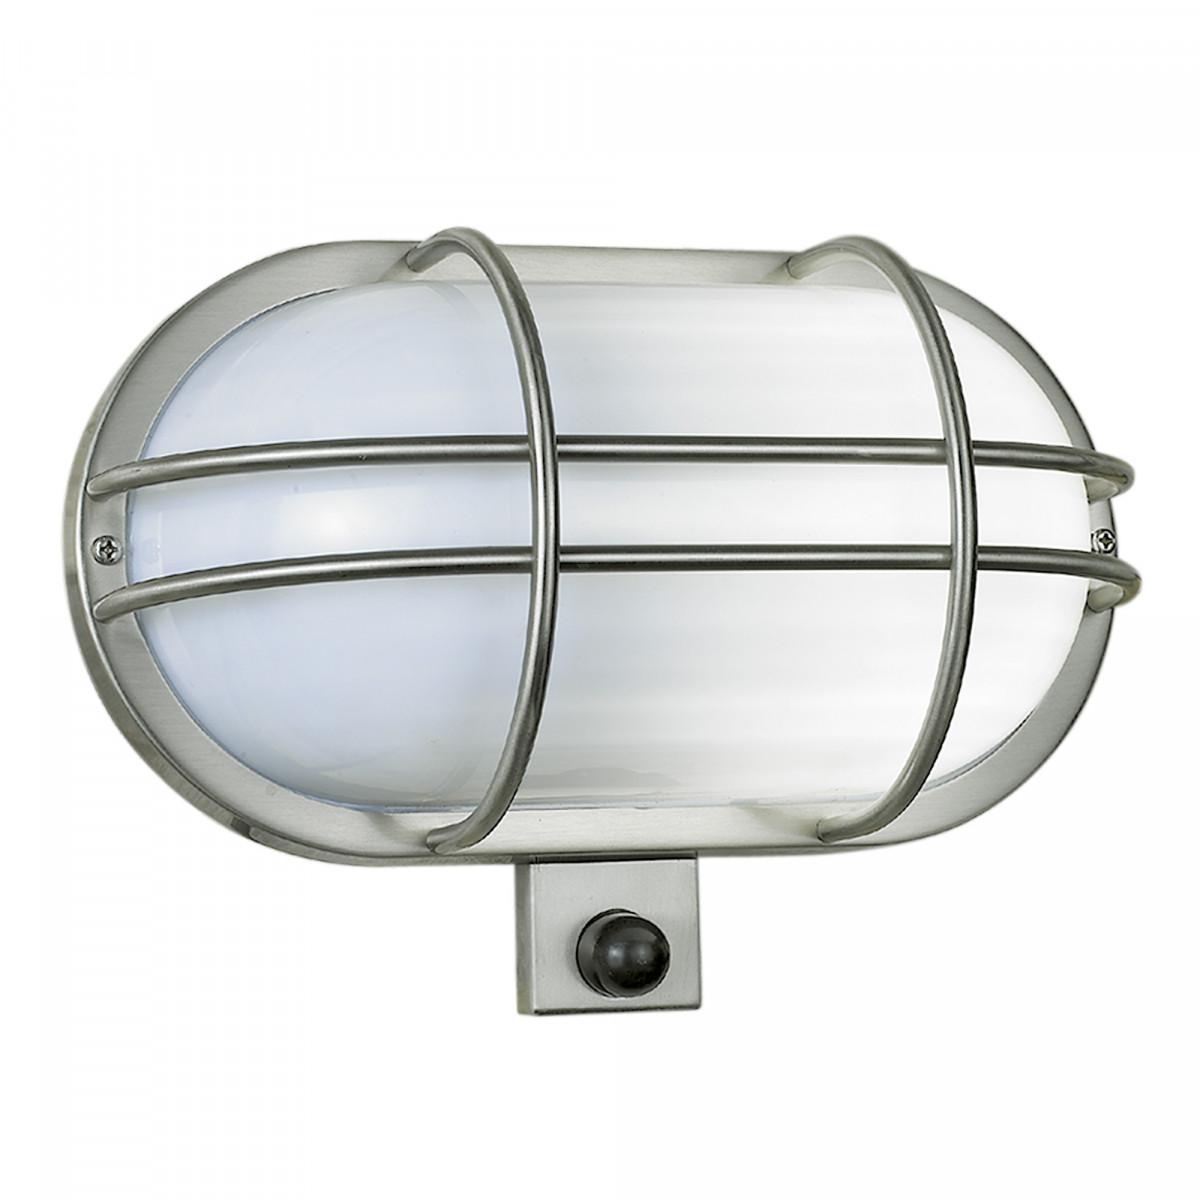 Muurlamp Sonn + bewegingssensor